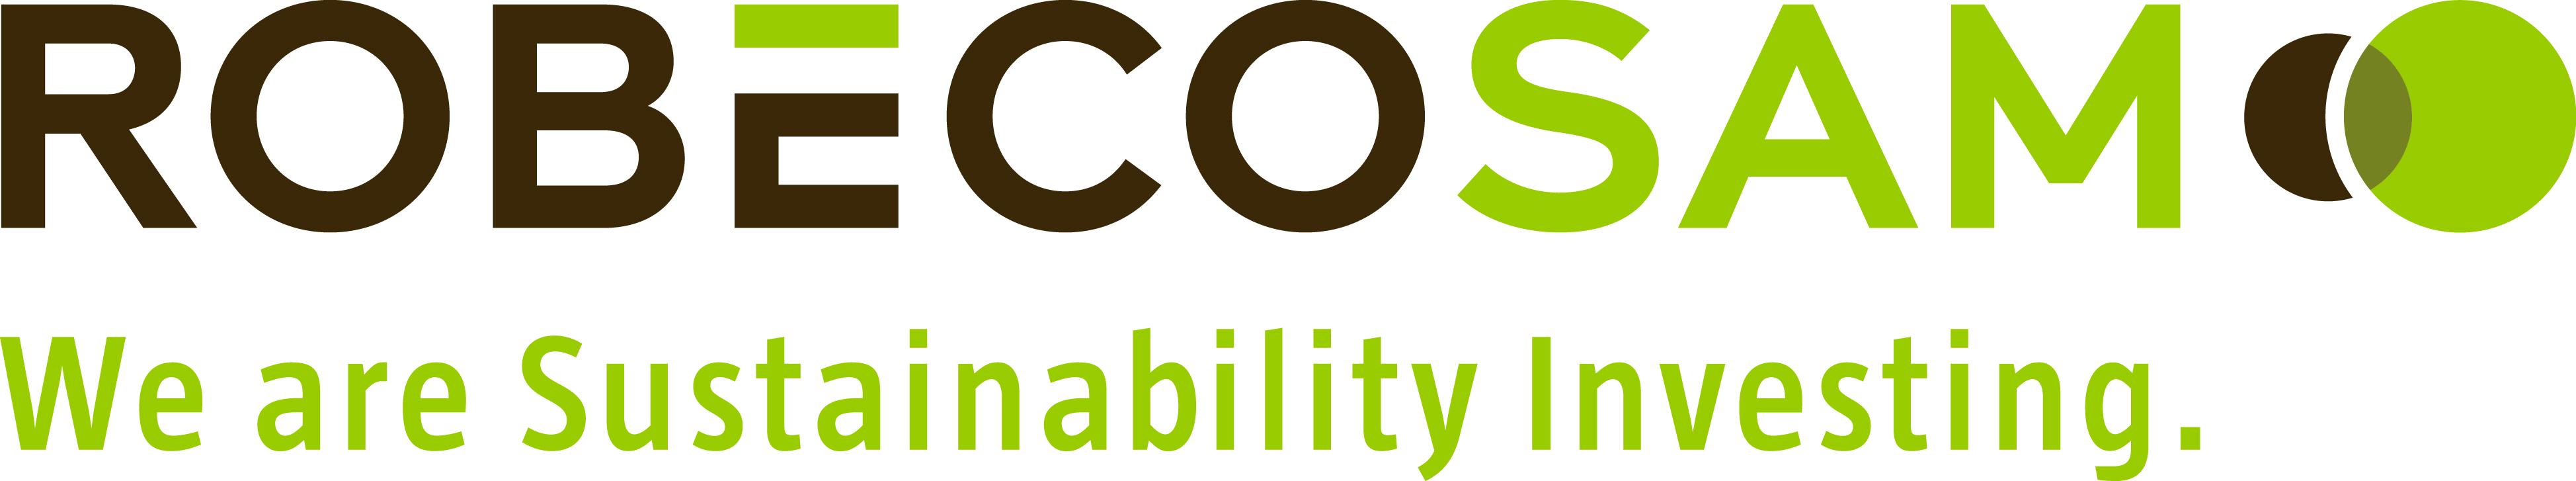 "RobecoSAM publishes The Sustainability Yearbook 2019 under ""SAM"" branding"